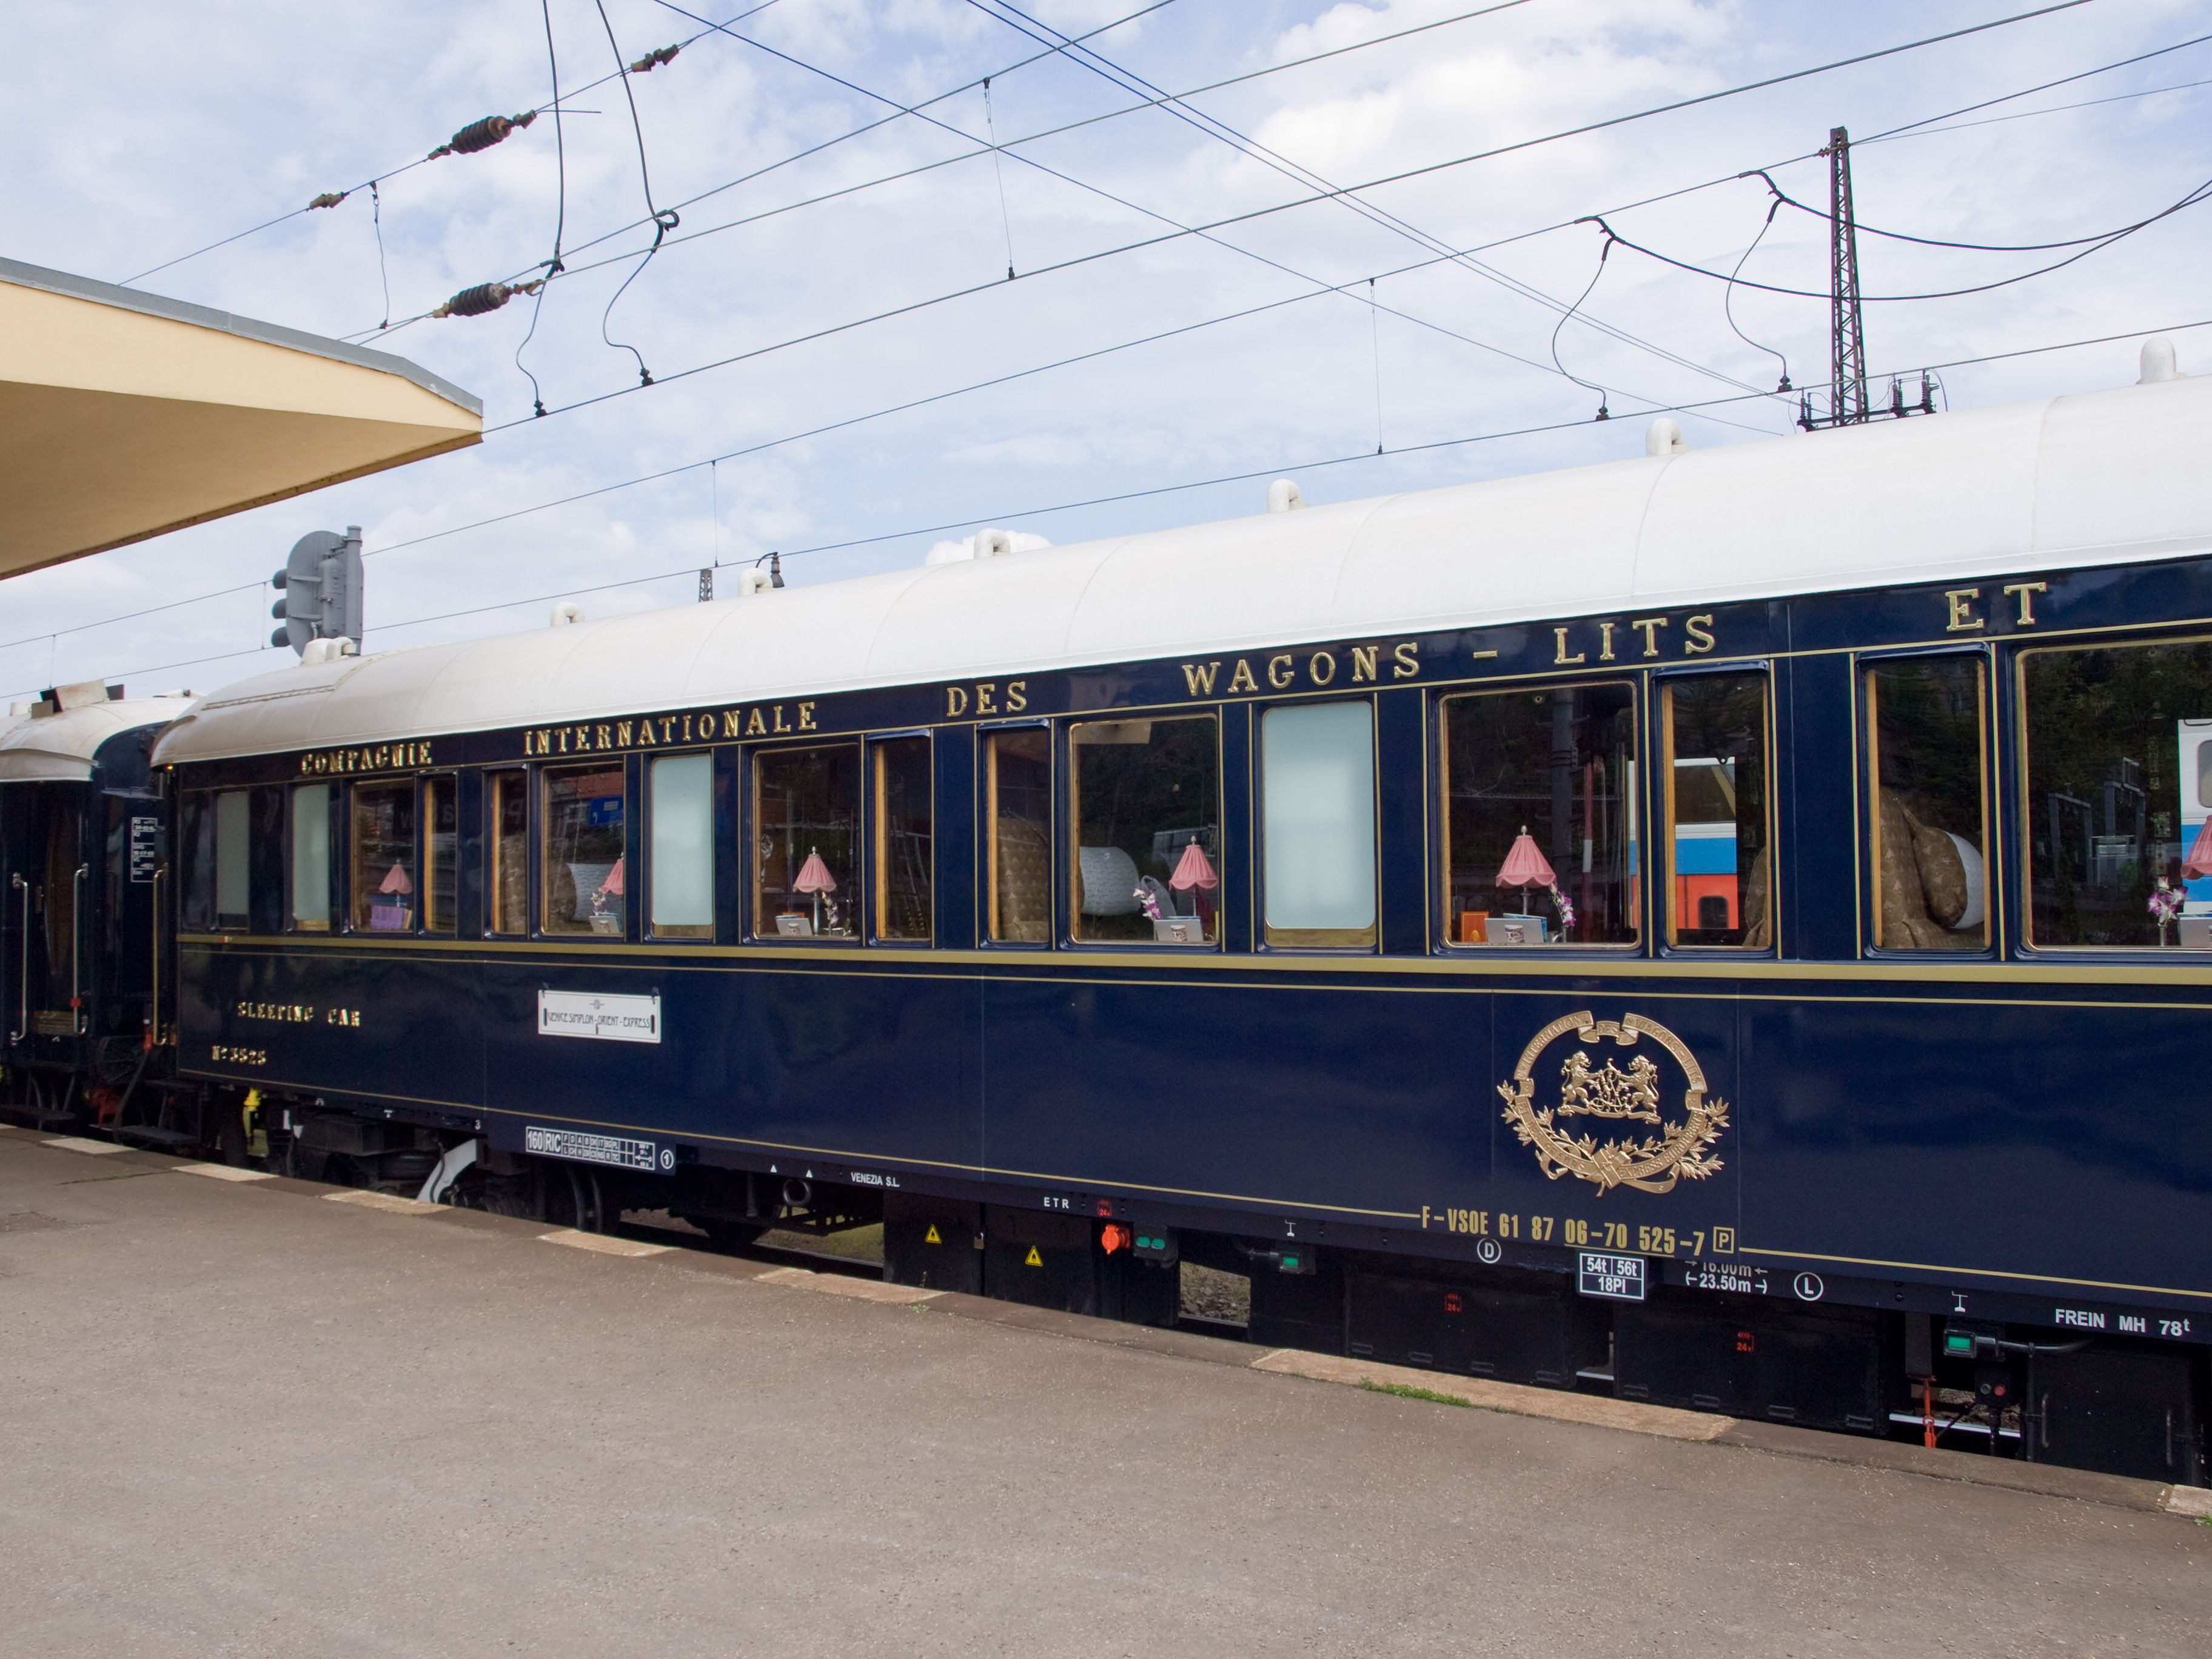 Praha-Smíchov,_Orient_Express,_vůz.jpg (Imagen JPEG, 3648 × 2736 píxeles)